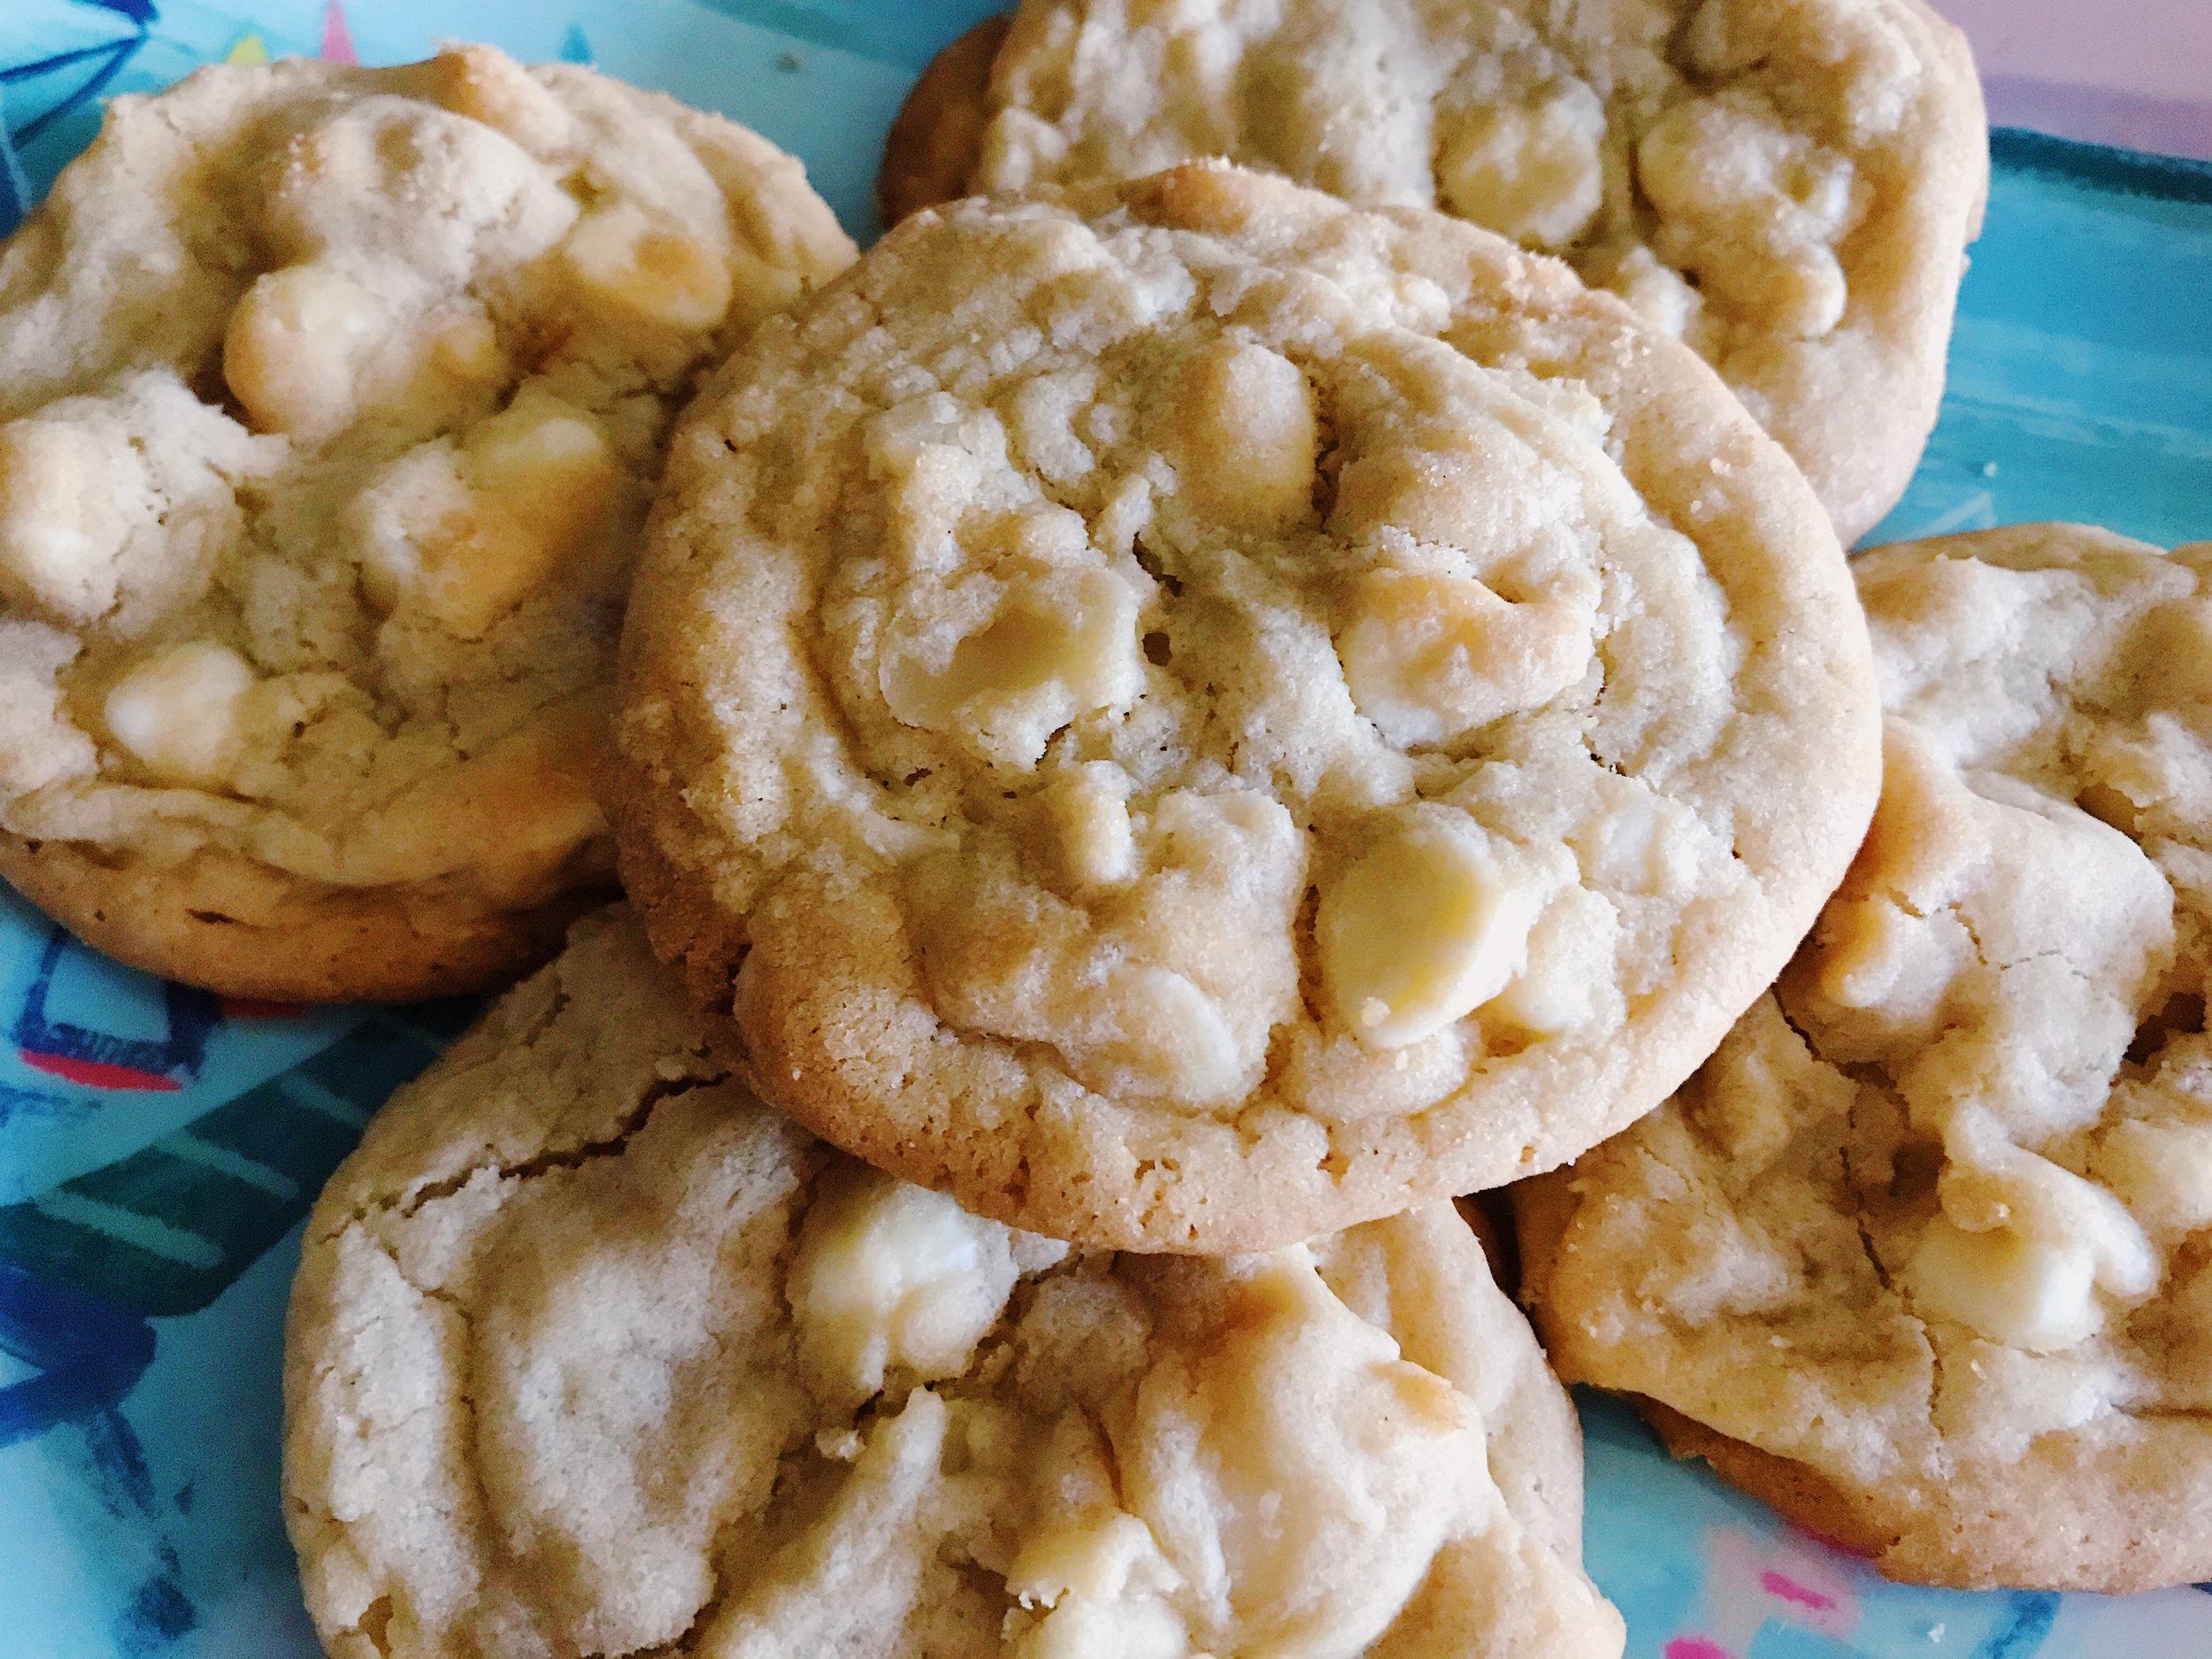 White Chocolate Chip Macadamia Cookie Recipe